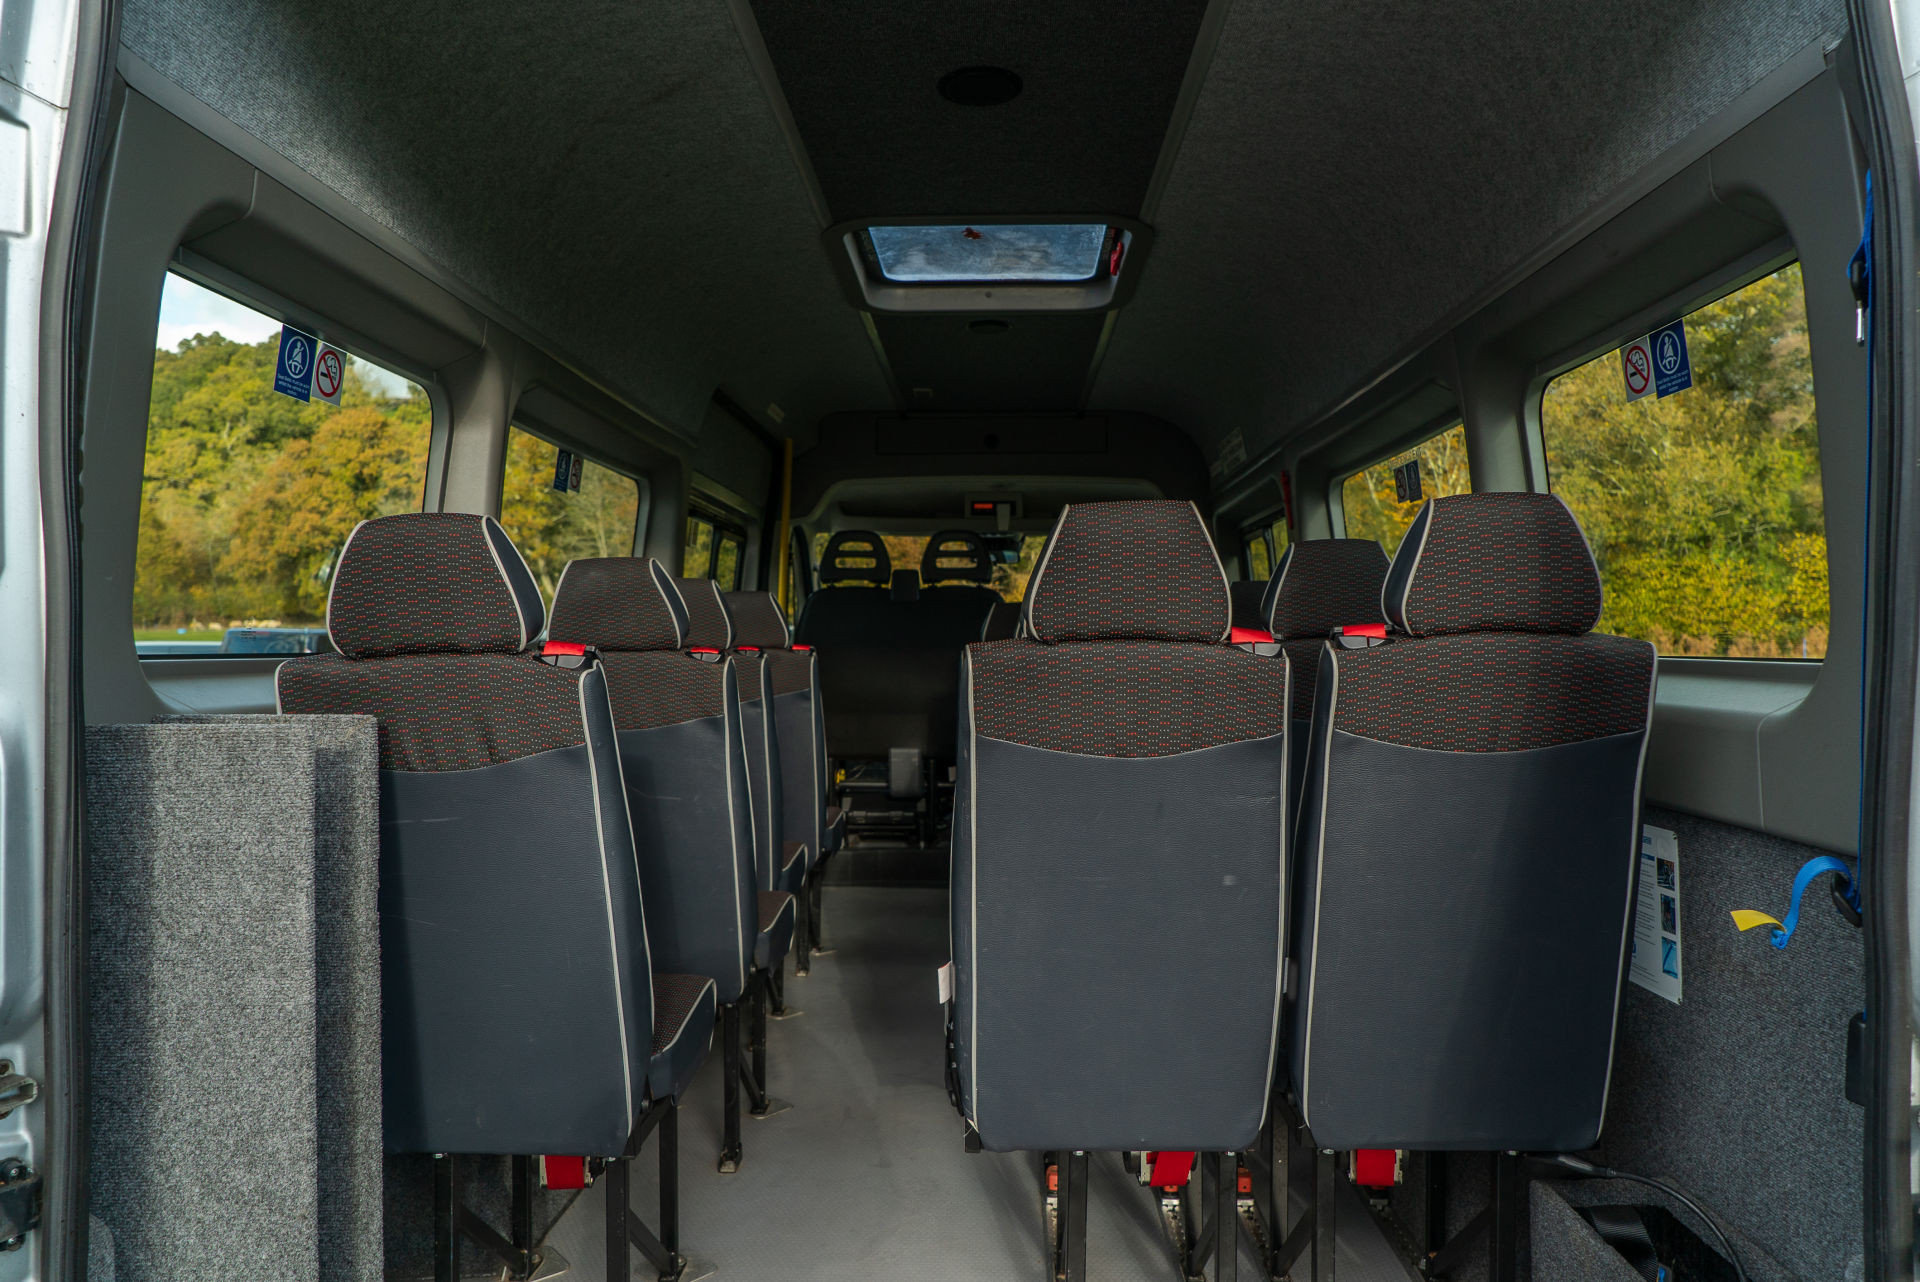 2015 Peugeot Boxer 17 Seater Accessible Minibus for Sale - Image 6